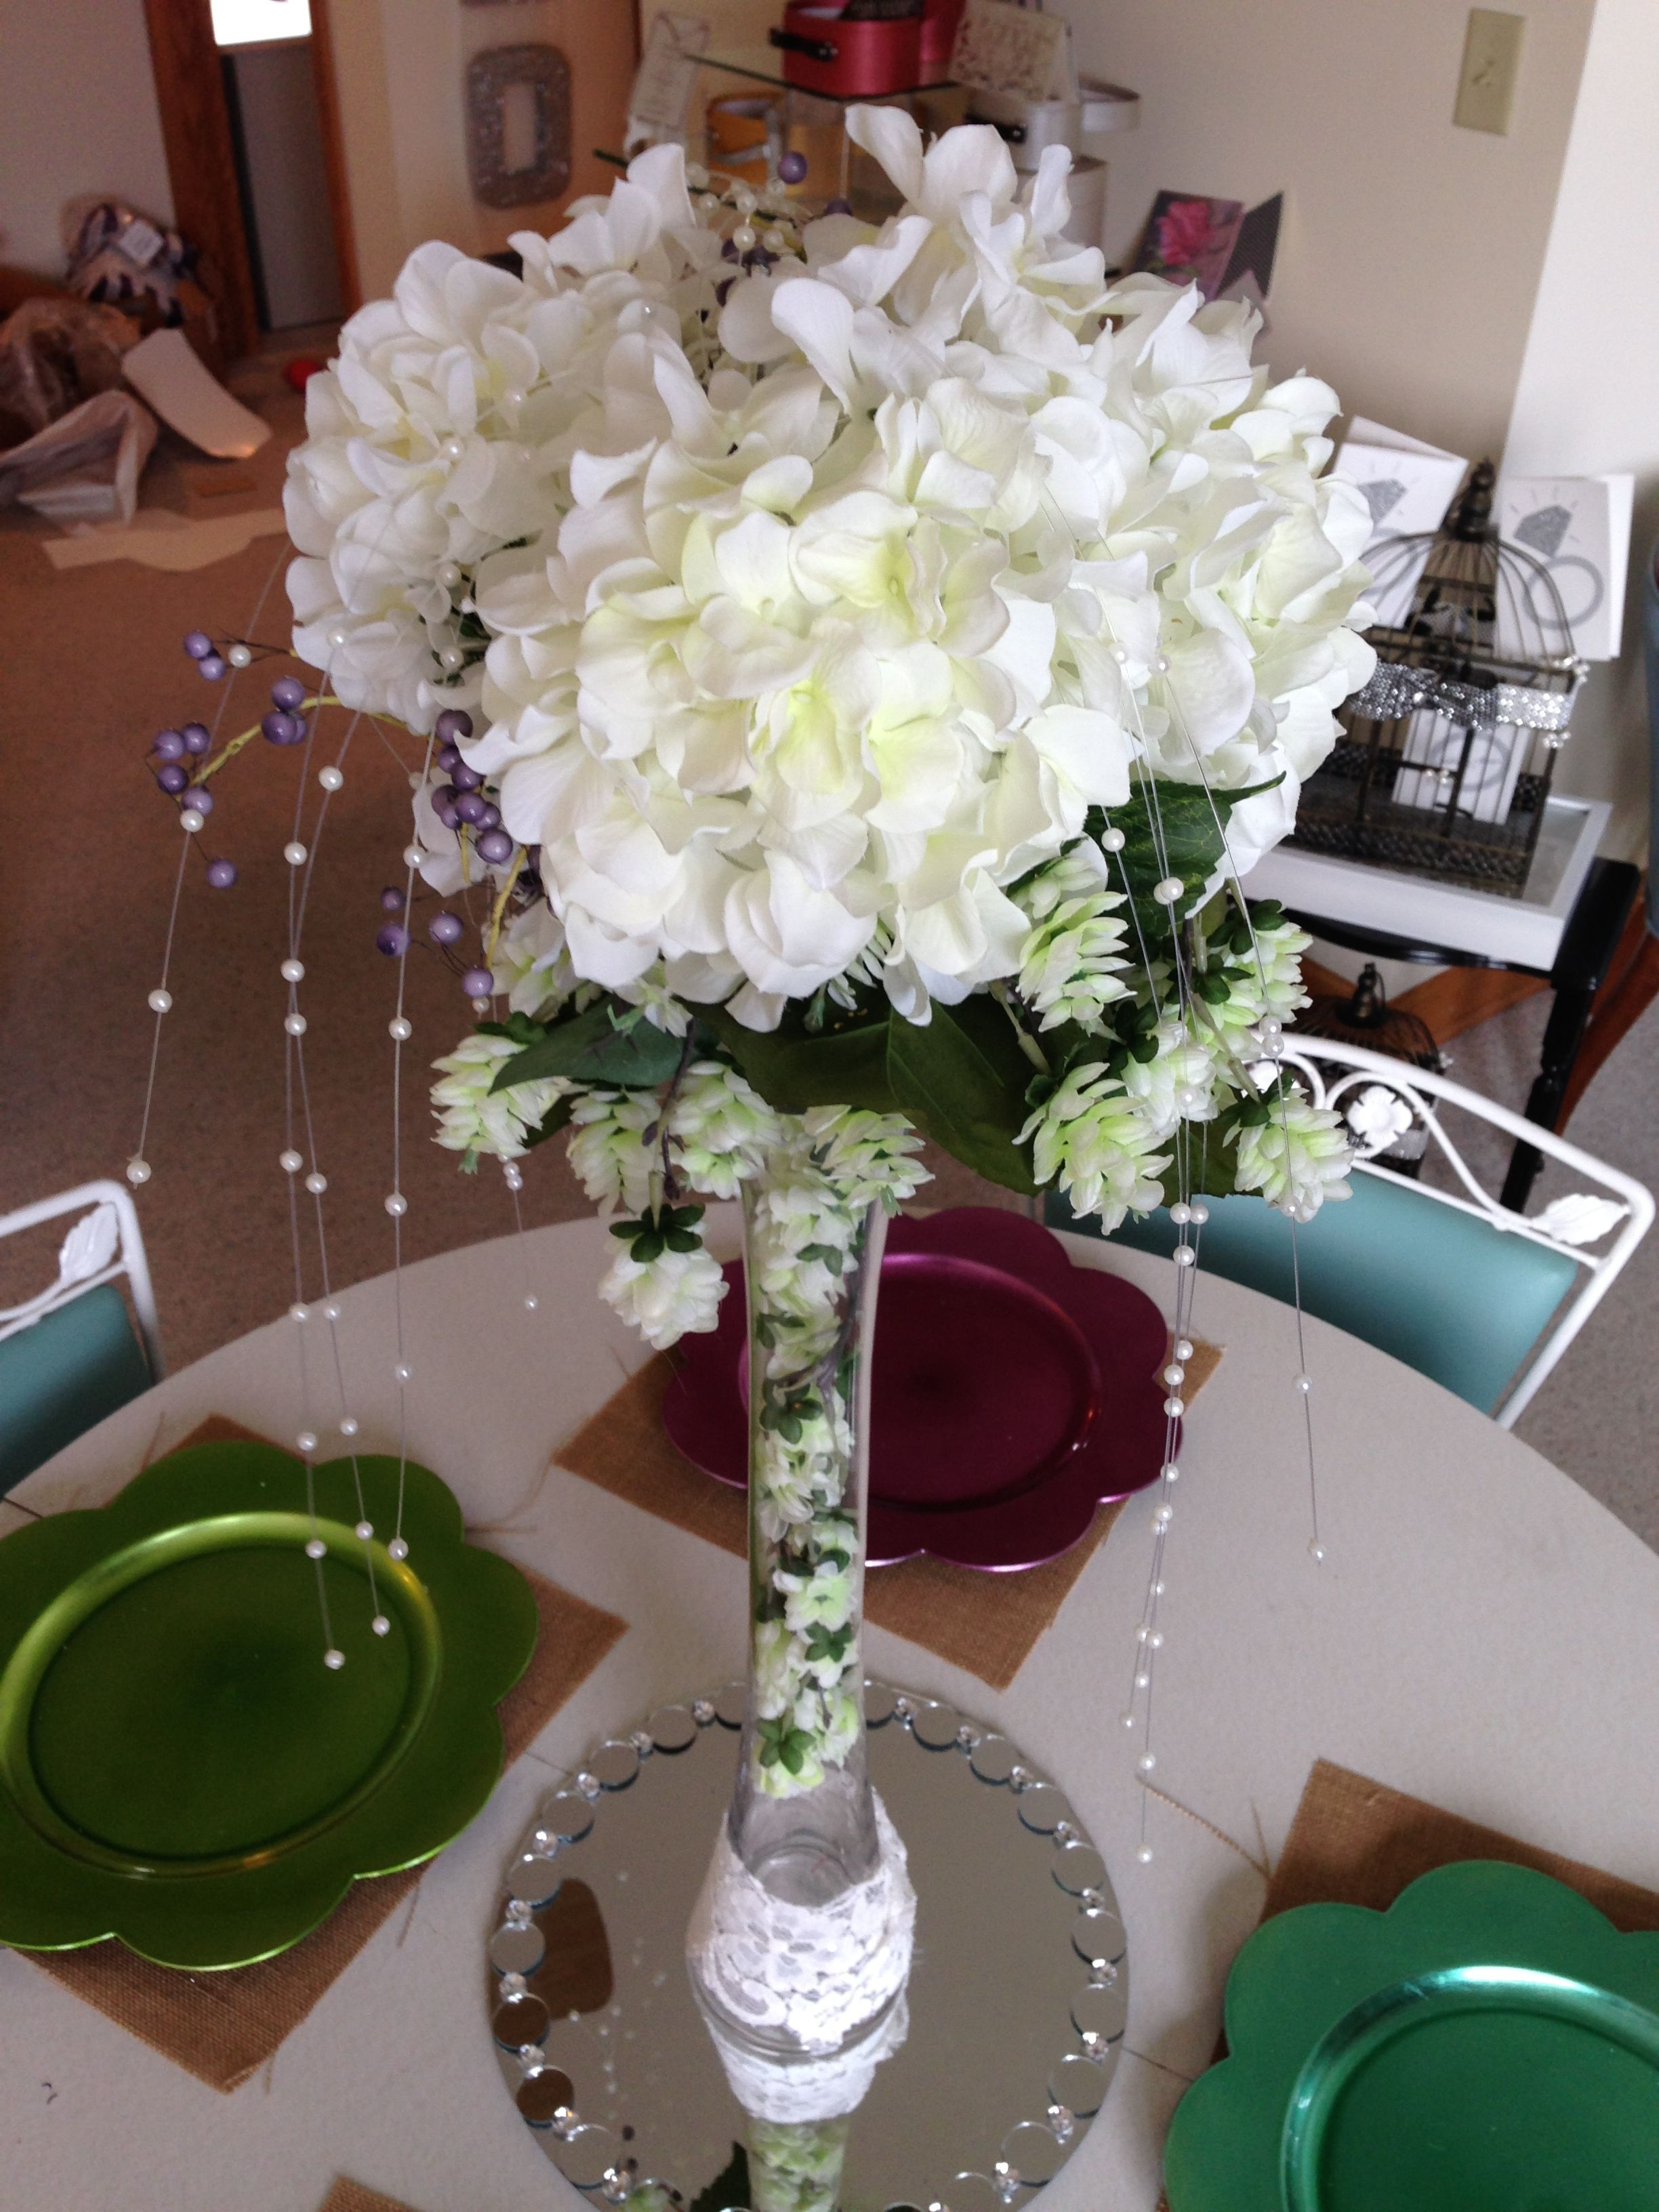 Table Centerpiece for wedding #table #centerpiece #wedding #weddingstyle #PSILoveYou